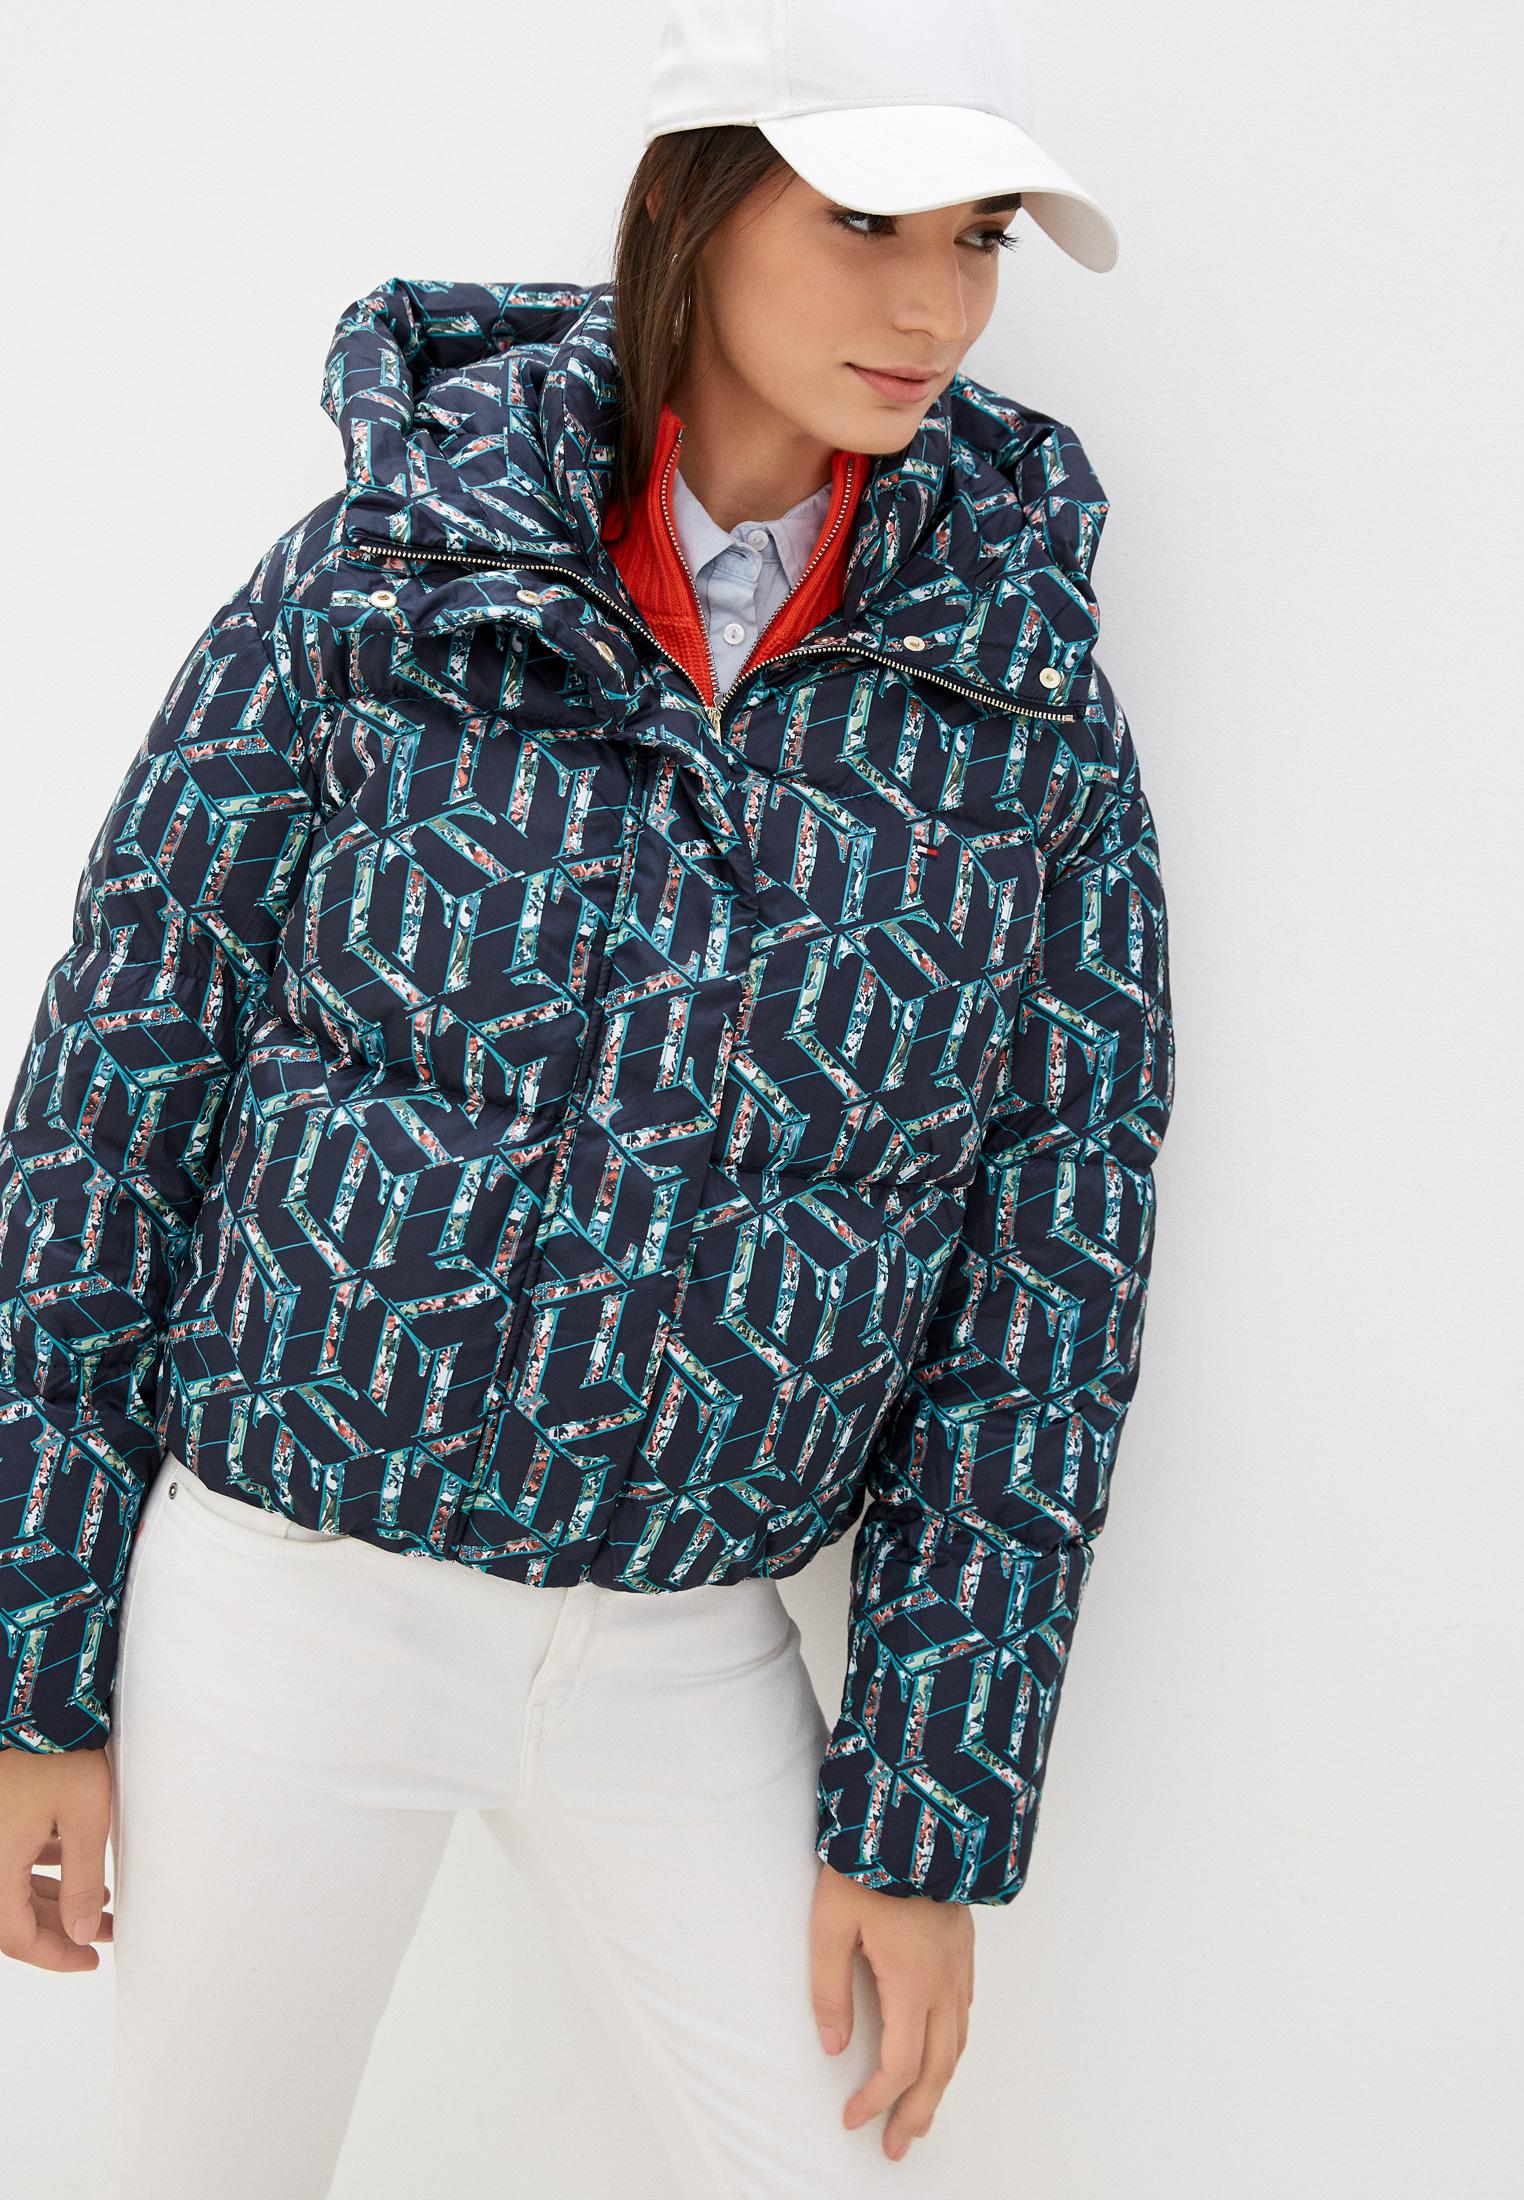 Утепленная куртка Tommy Hilfiger (Томми Хилфигер) WW0WW31031